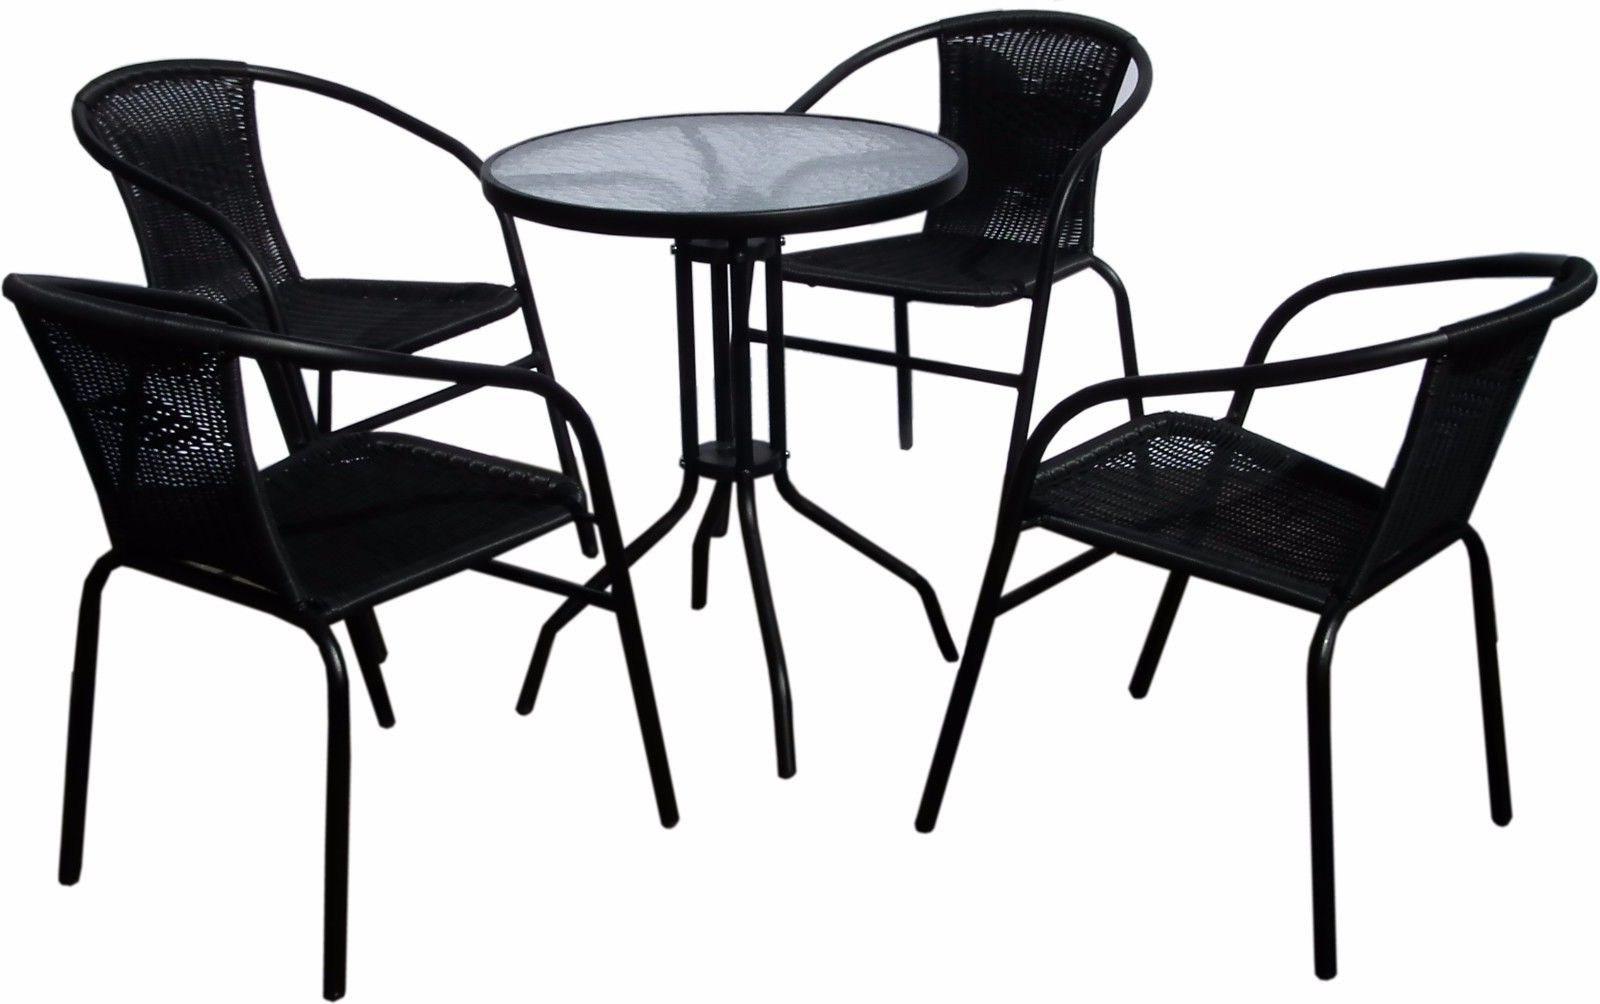 Super Hot Item 5 Piece Black Miniature Garden Patio Furniture Download Free Architecture Designs Scobabritishbridgeorg